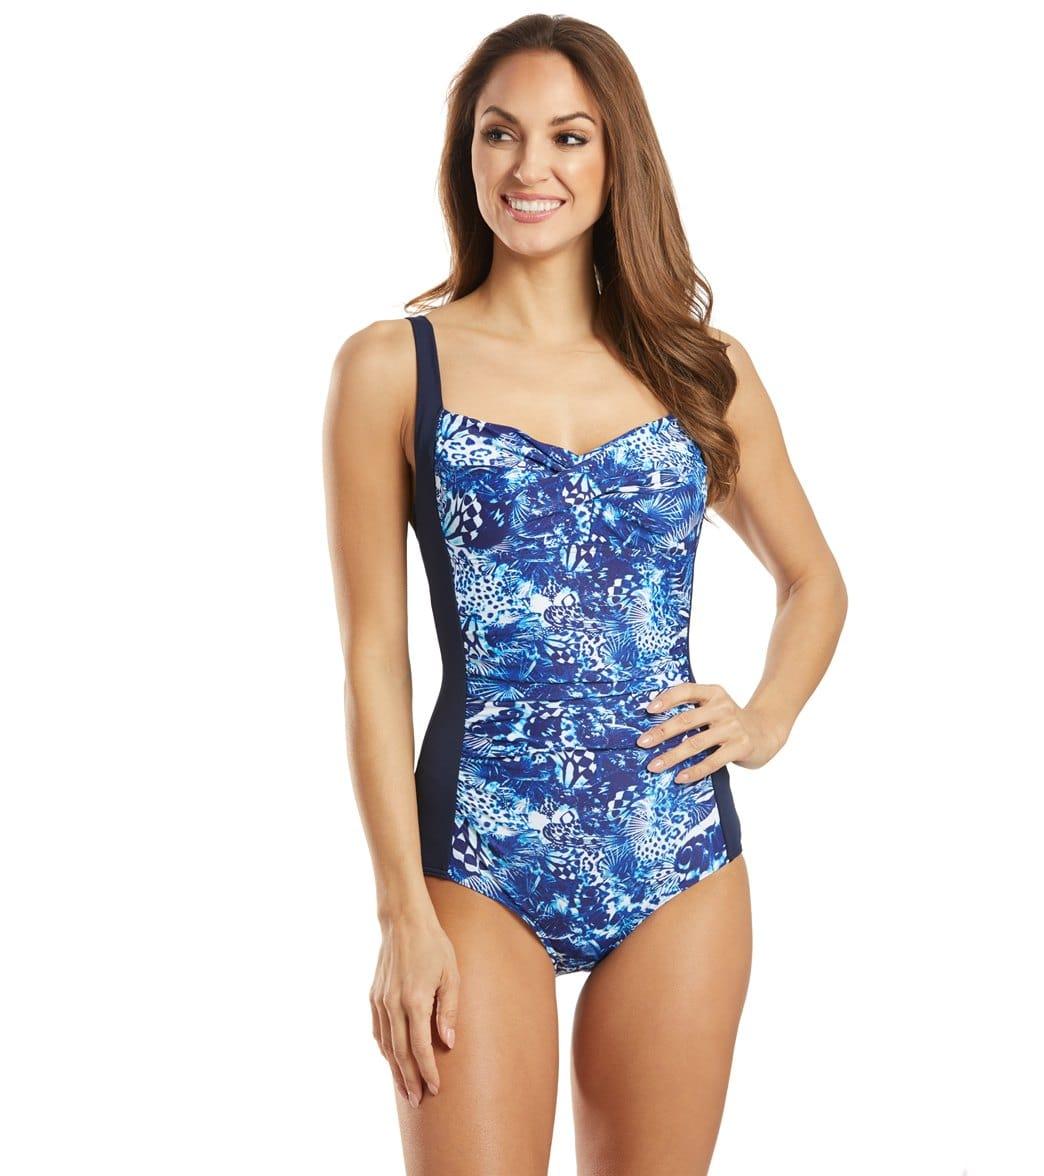 Funkita Women's Animalia Ruched One Piece Swimsuit Chlorine Resistant Swimsuit